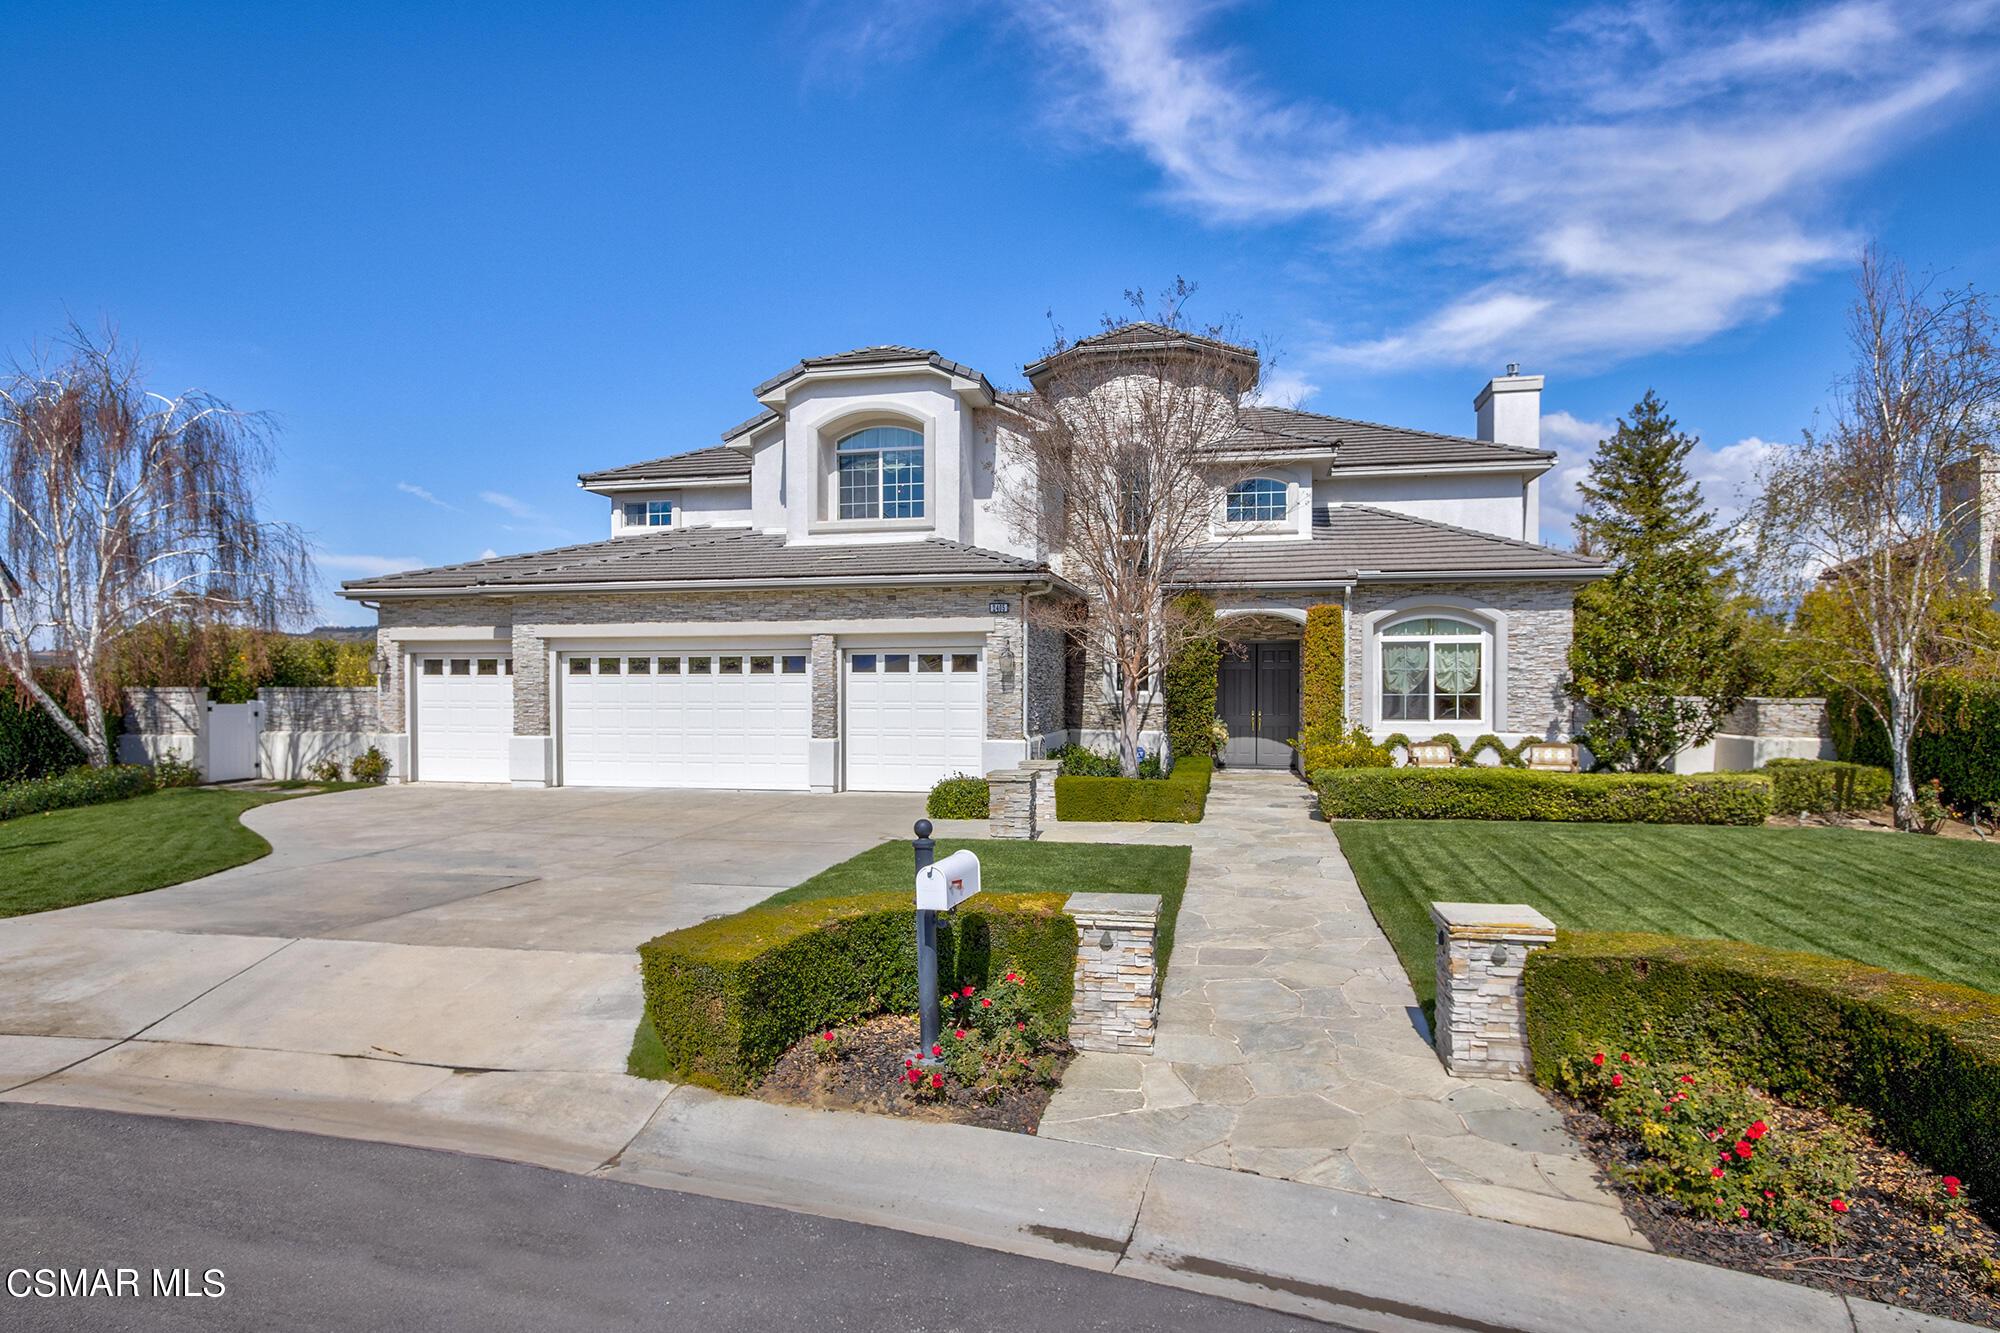 Photo of 2405 Woodcreek Road, Camarillo, CA 93012